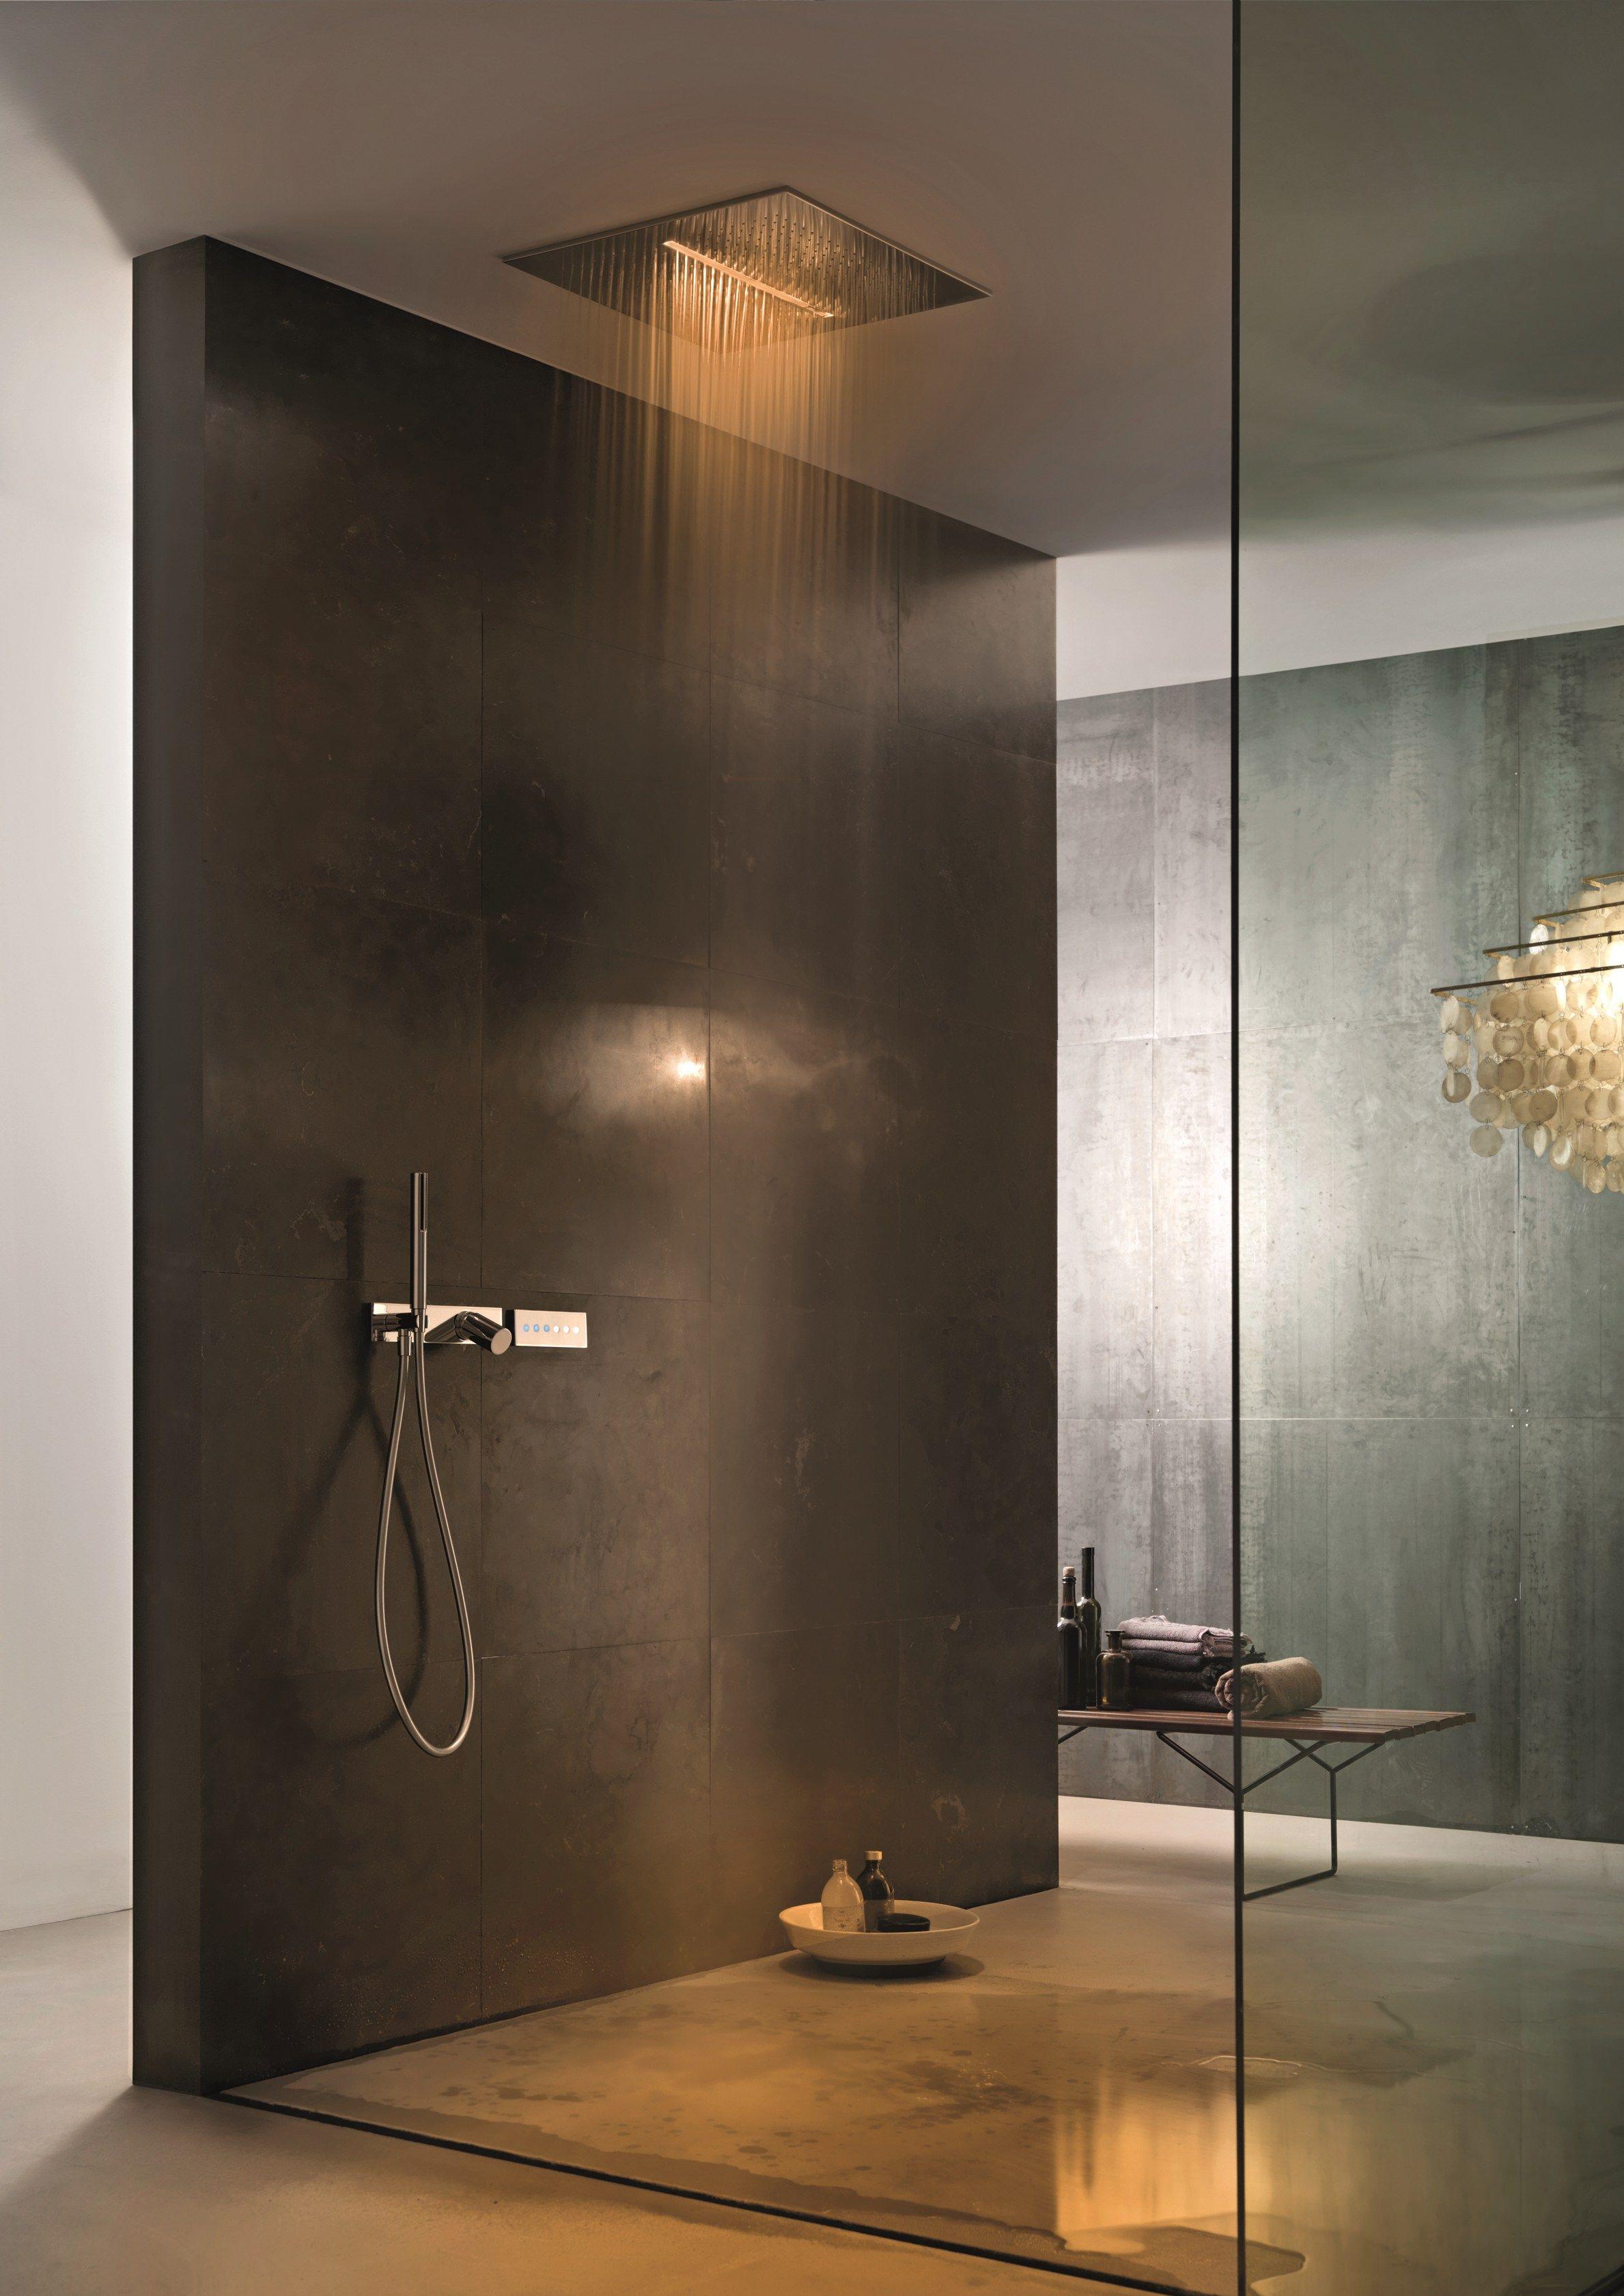 Acqua Zone Dream Shower Mixer With Diverter By Fantini